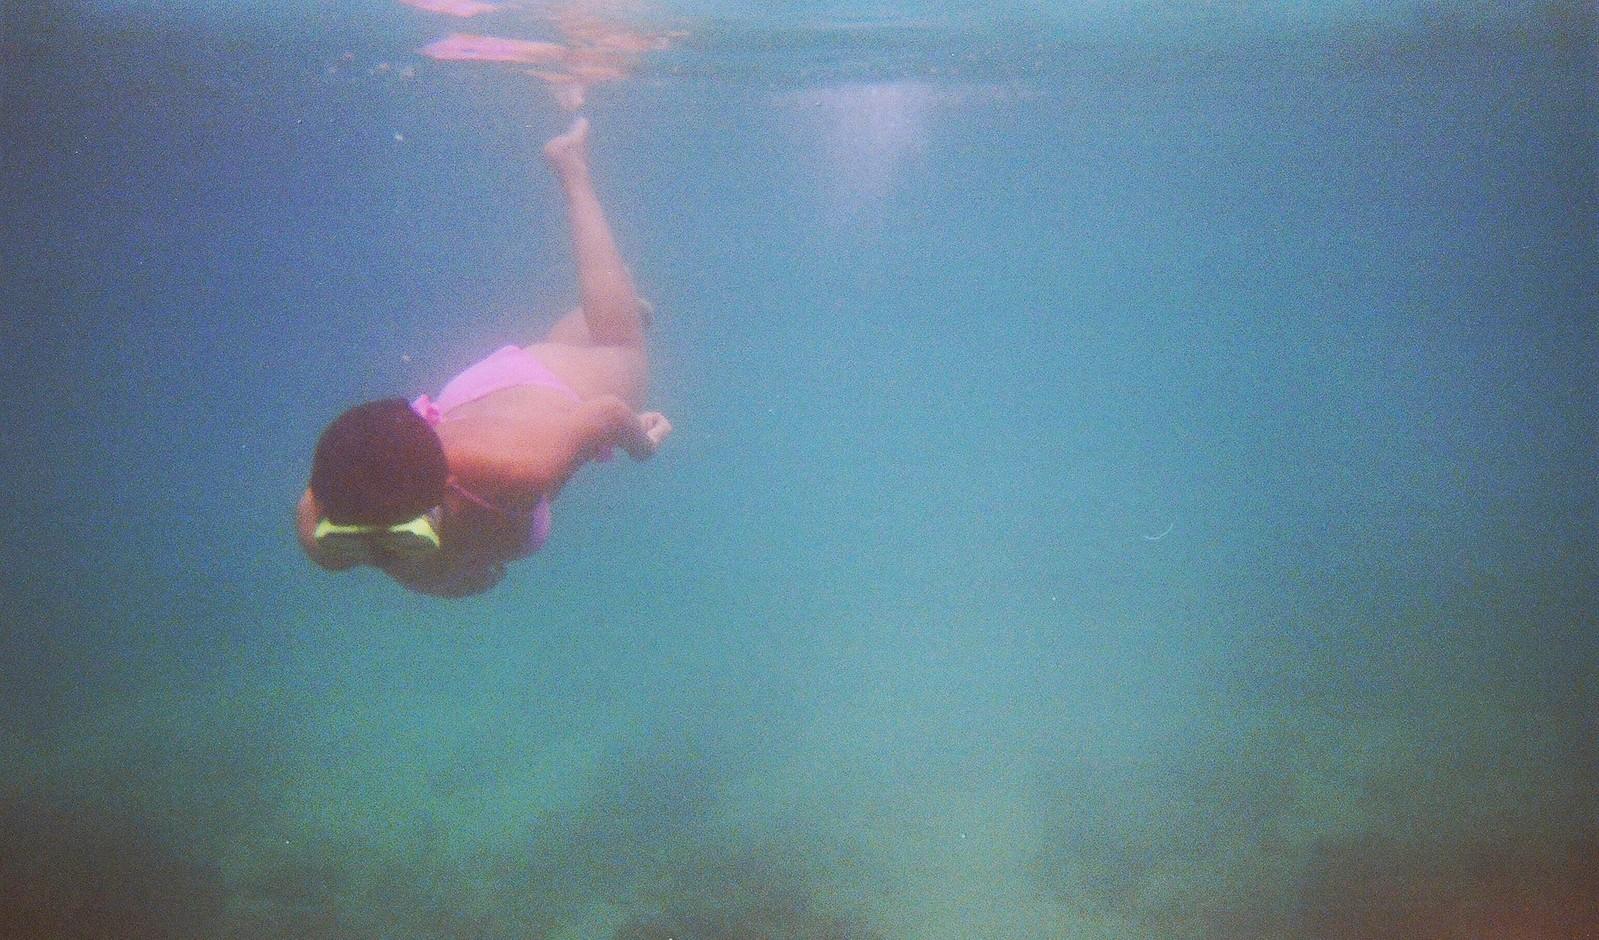 Snorkeling in Taiwan's Beaches